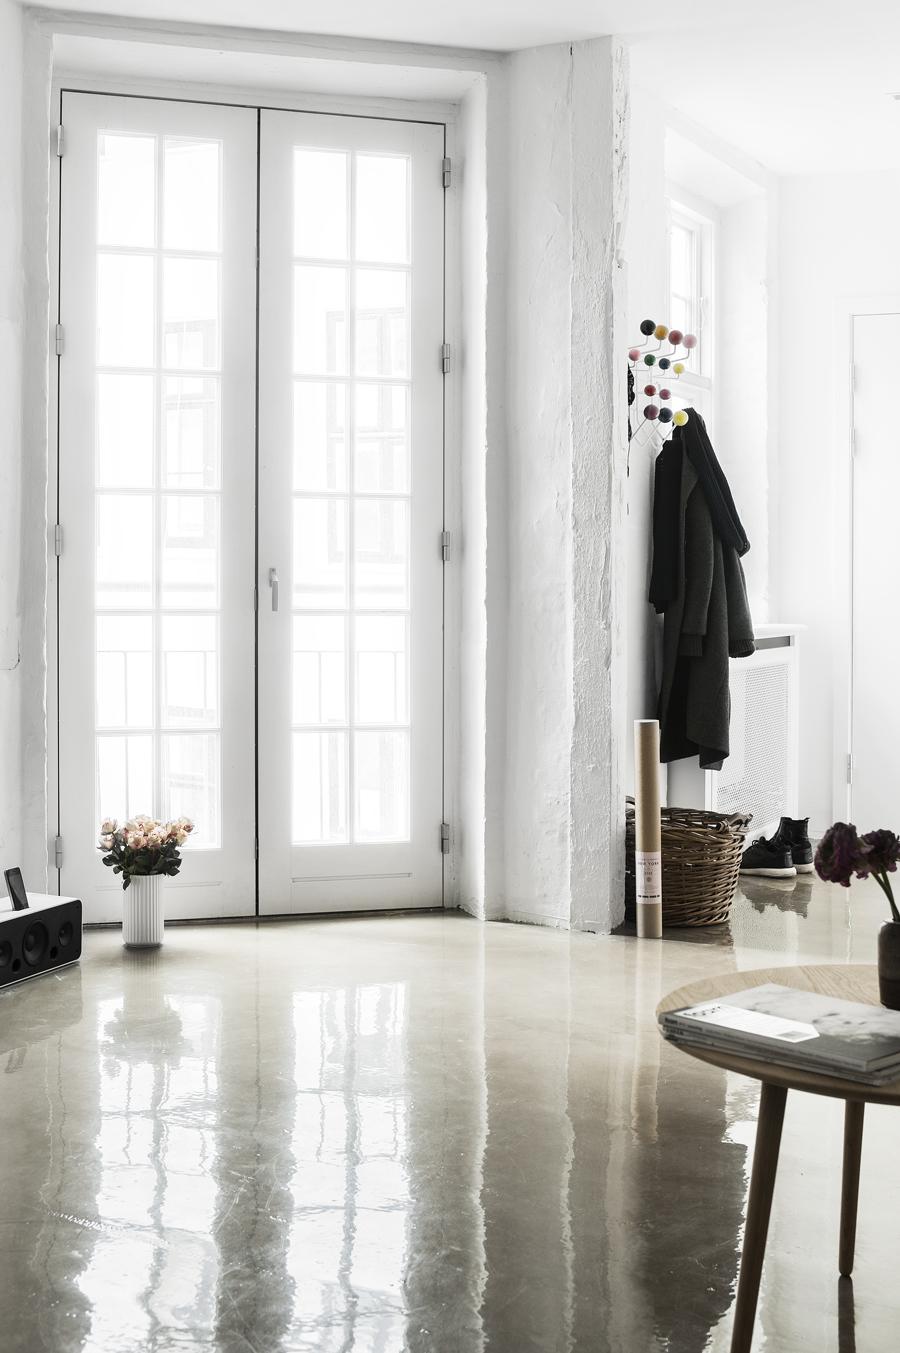 Image result for white marble floor